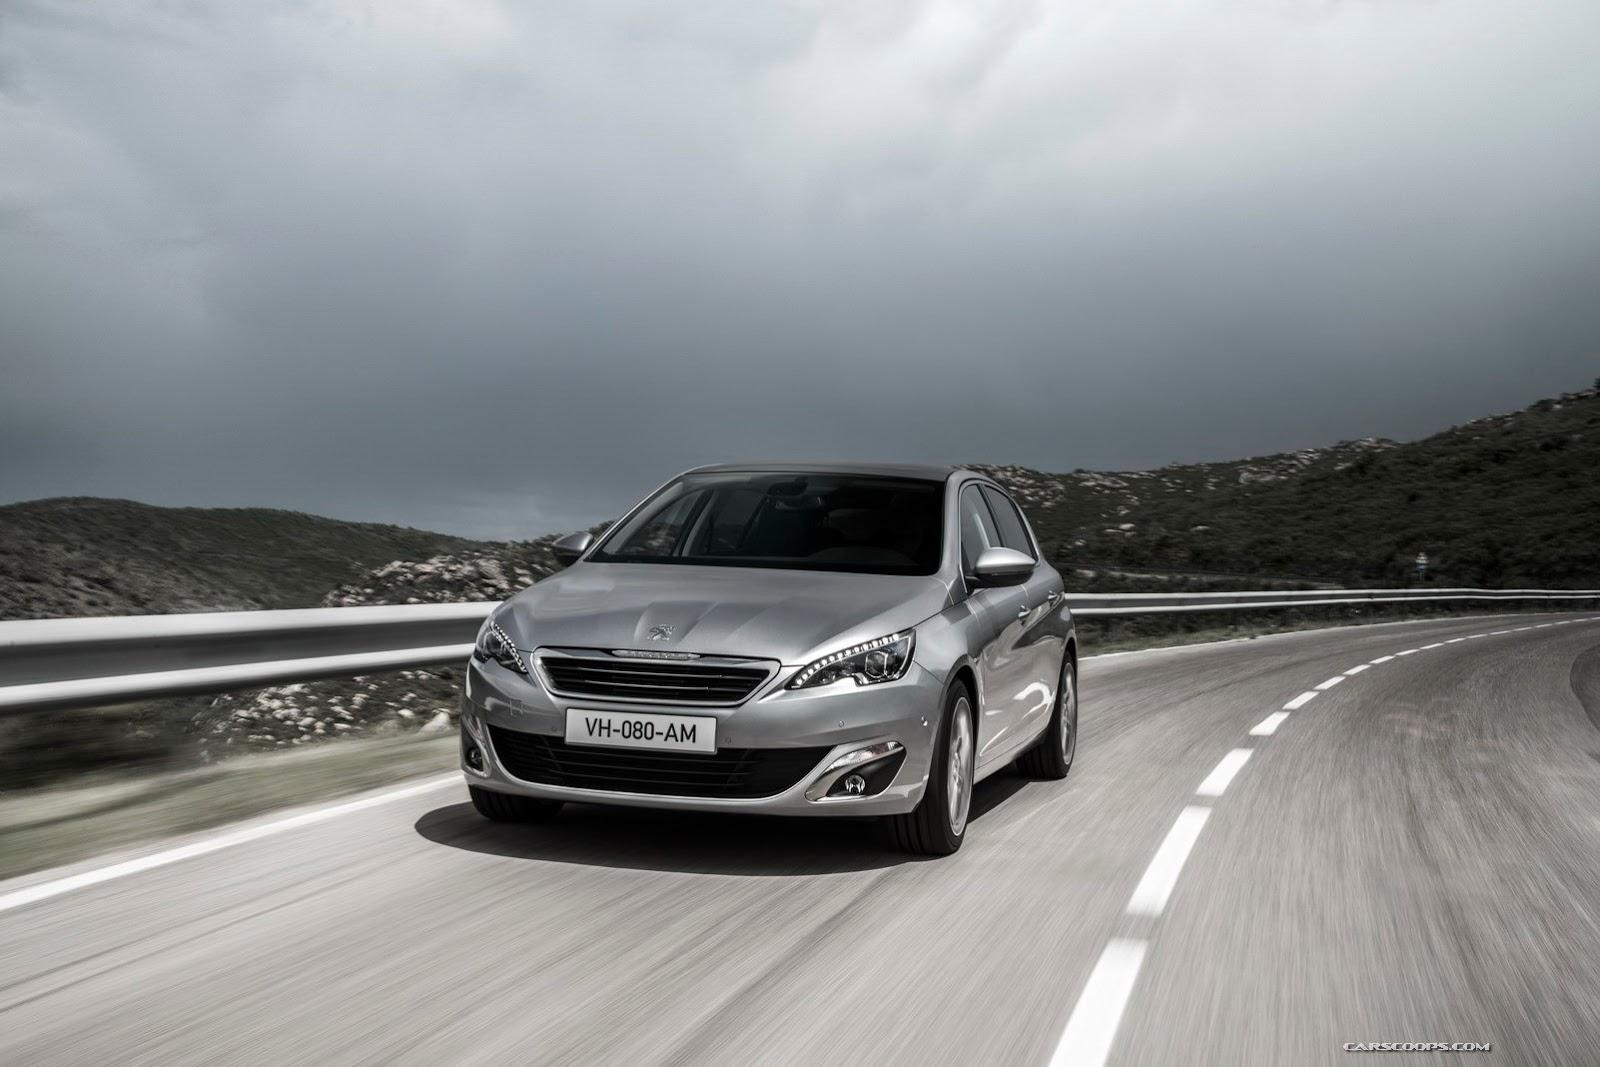 2014-Peugeot-308-Hatch-Carscoops-89%25255B2%25255D.jpg